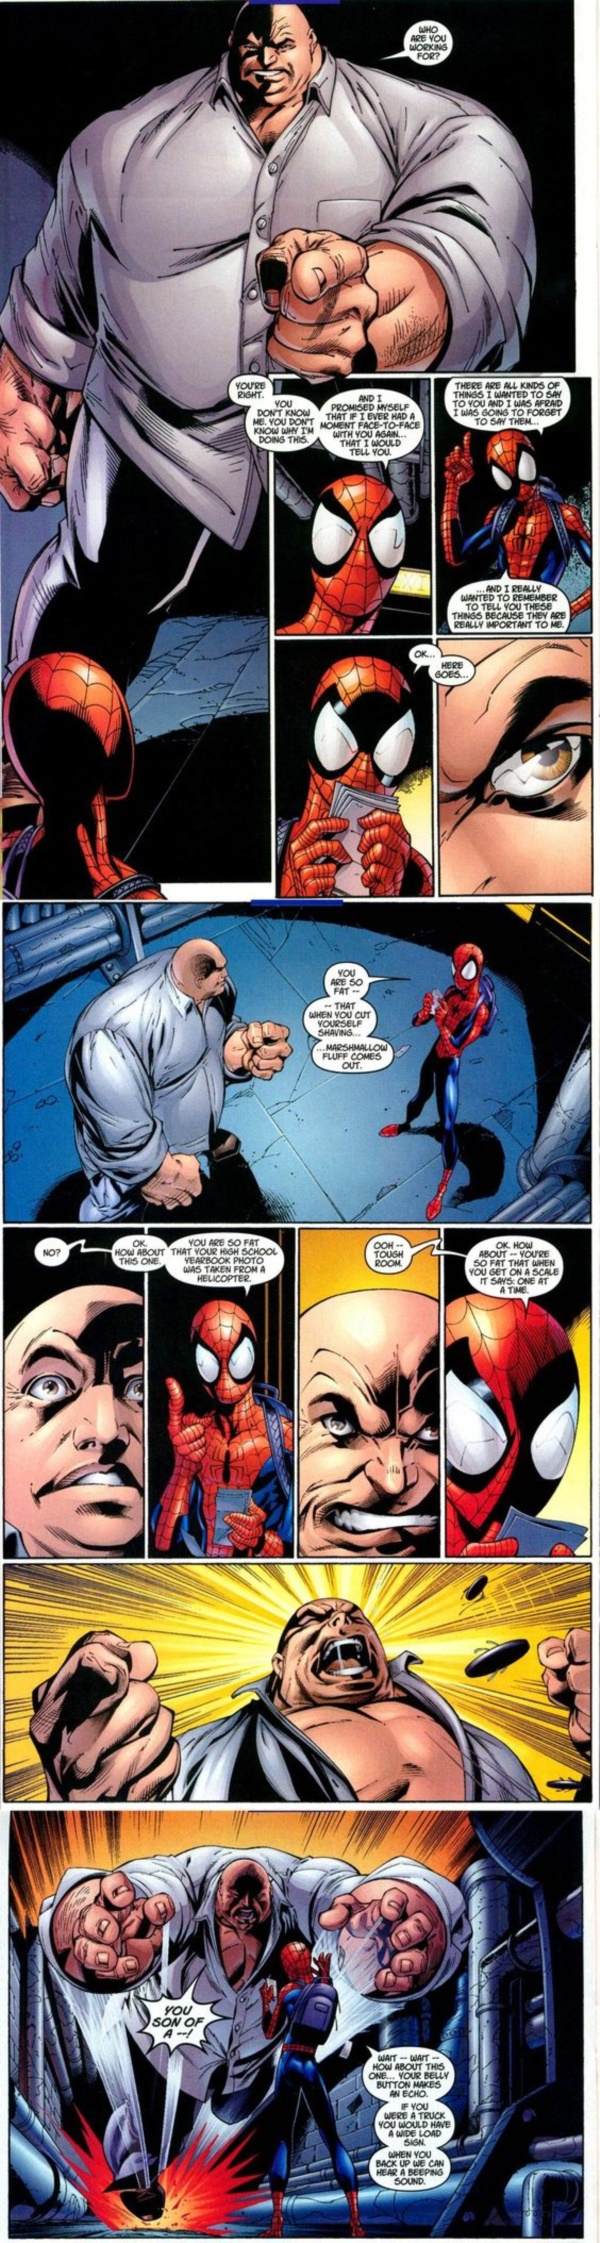 free-superhero-comic-strips-to-read0021